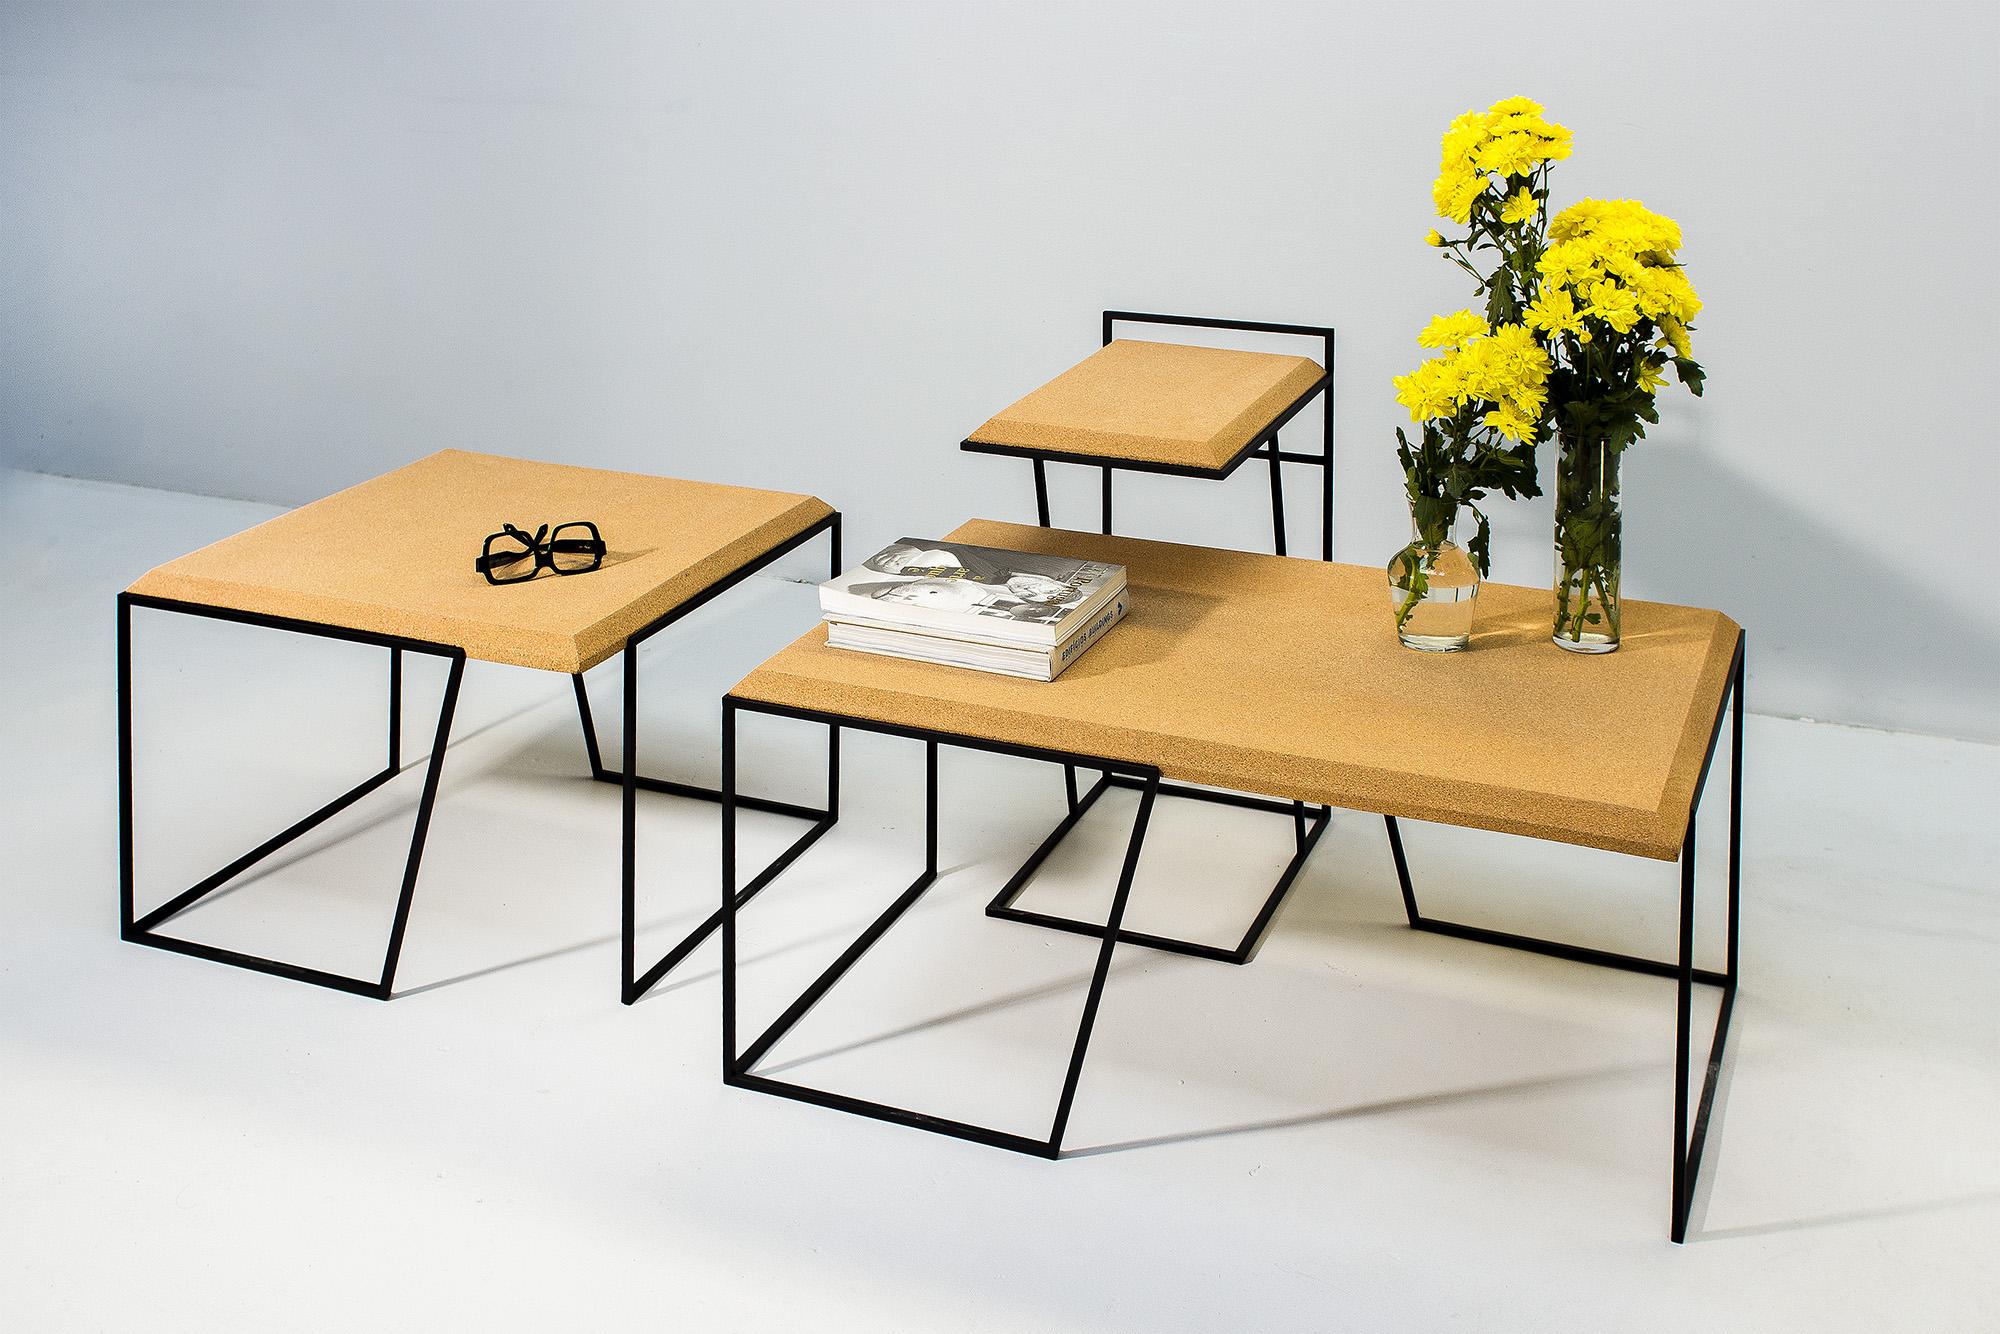 low-Galula-Grão-tables-collection-light-cork-black-11.jpg